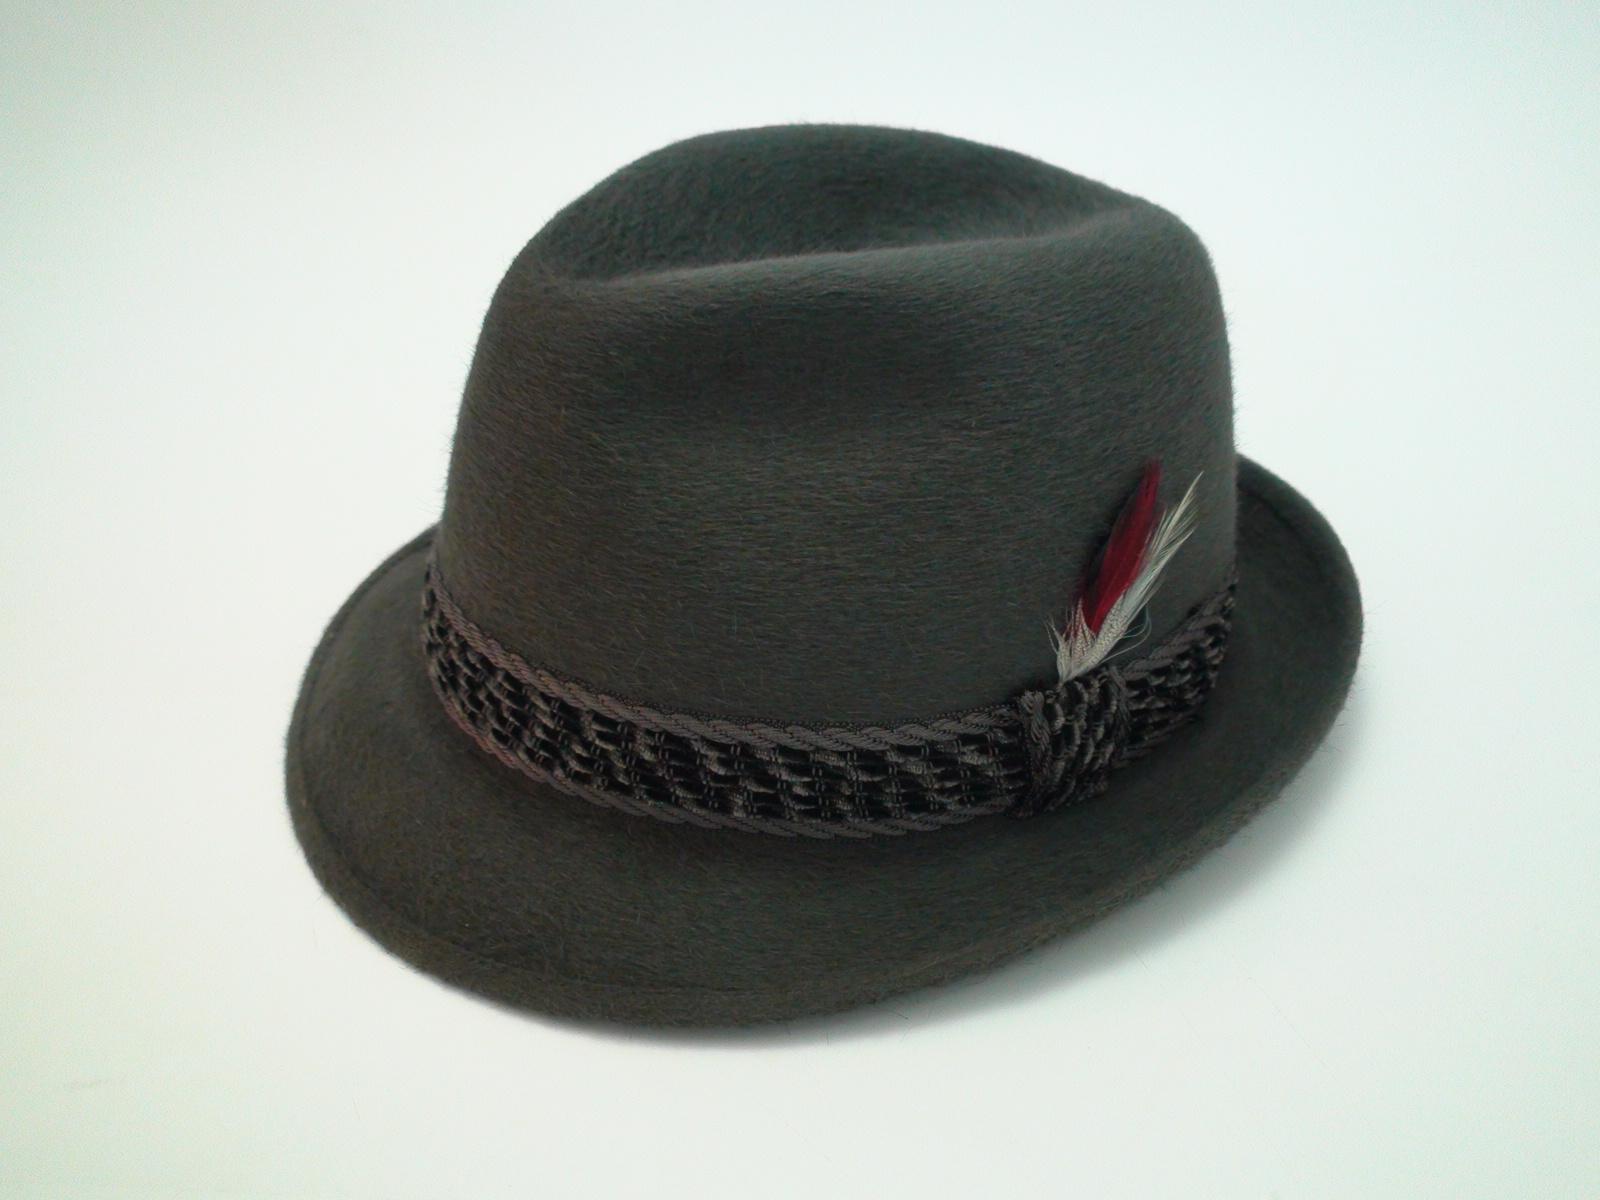 Dobbs Fifth Avenue New York Charcoal Fur Felt Fedora Trilby Hat 2becca4b77d